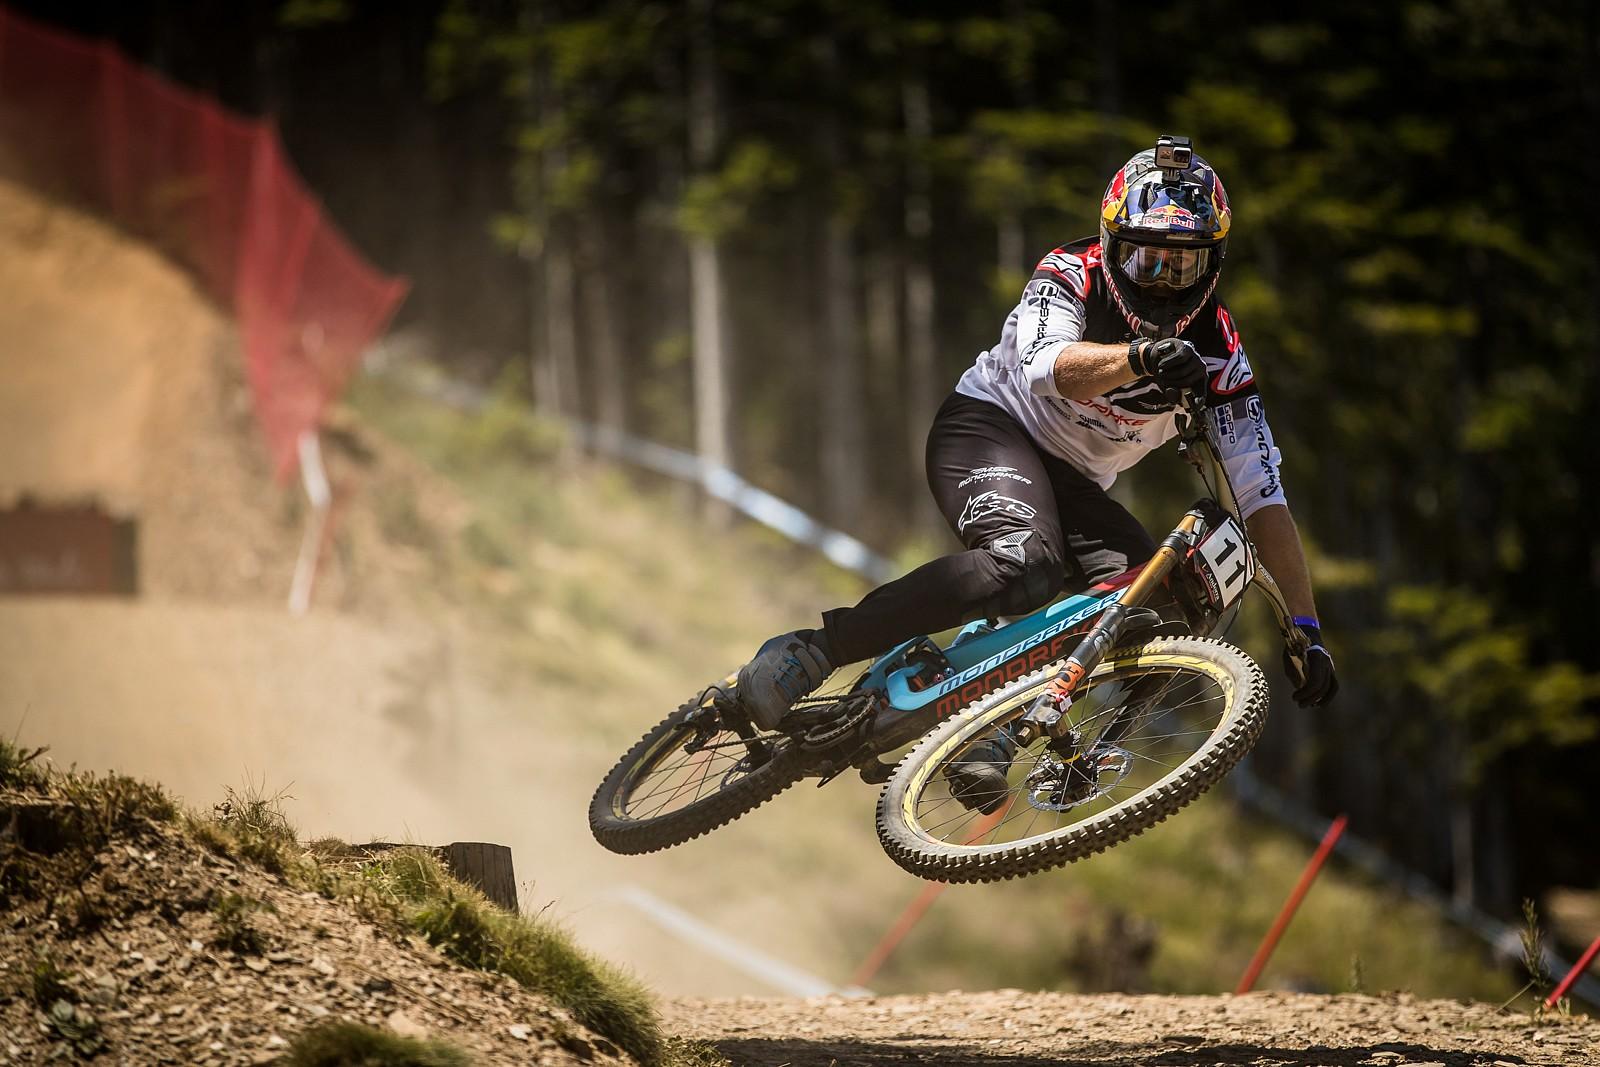 Anihilating Andorra, Brook Macdonald - A Big Bad Batch of Brook Macdonald Bangers - Mountain Biking Pictures - Vital MTB